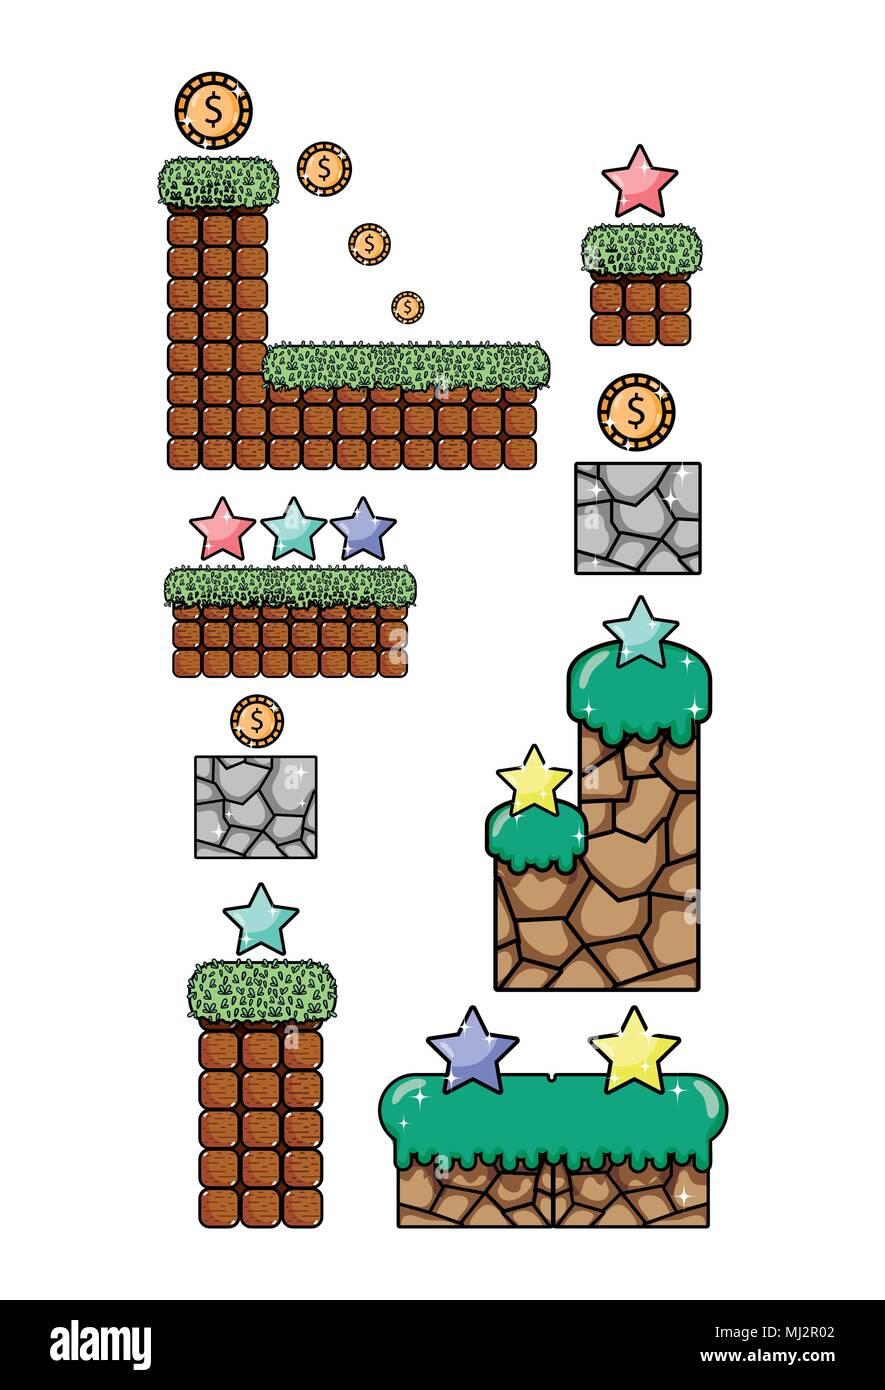 Set of retro videogames items - Stock Image